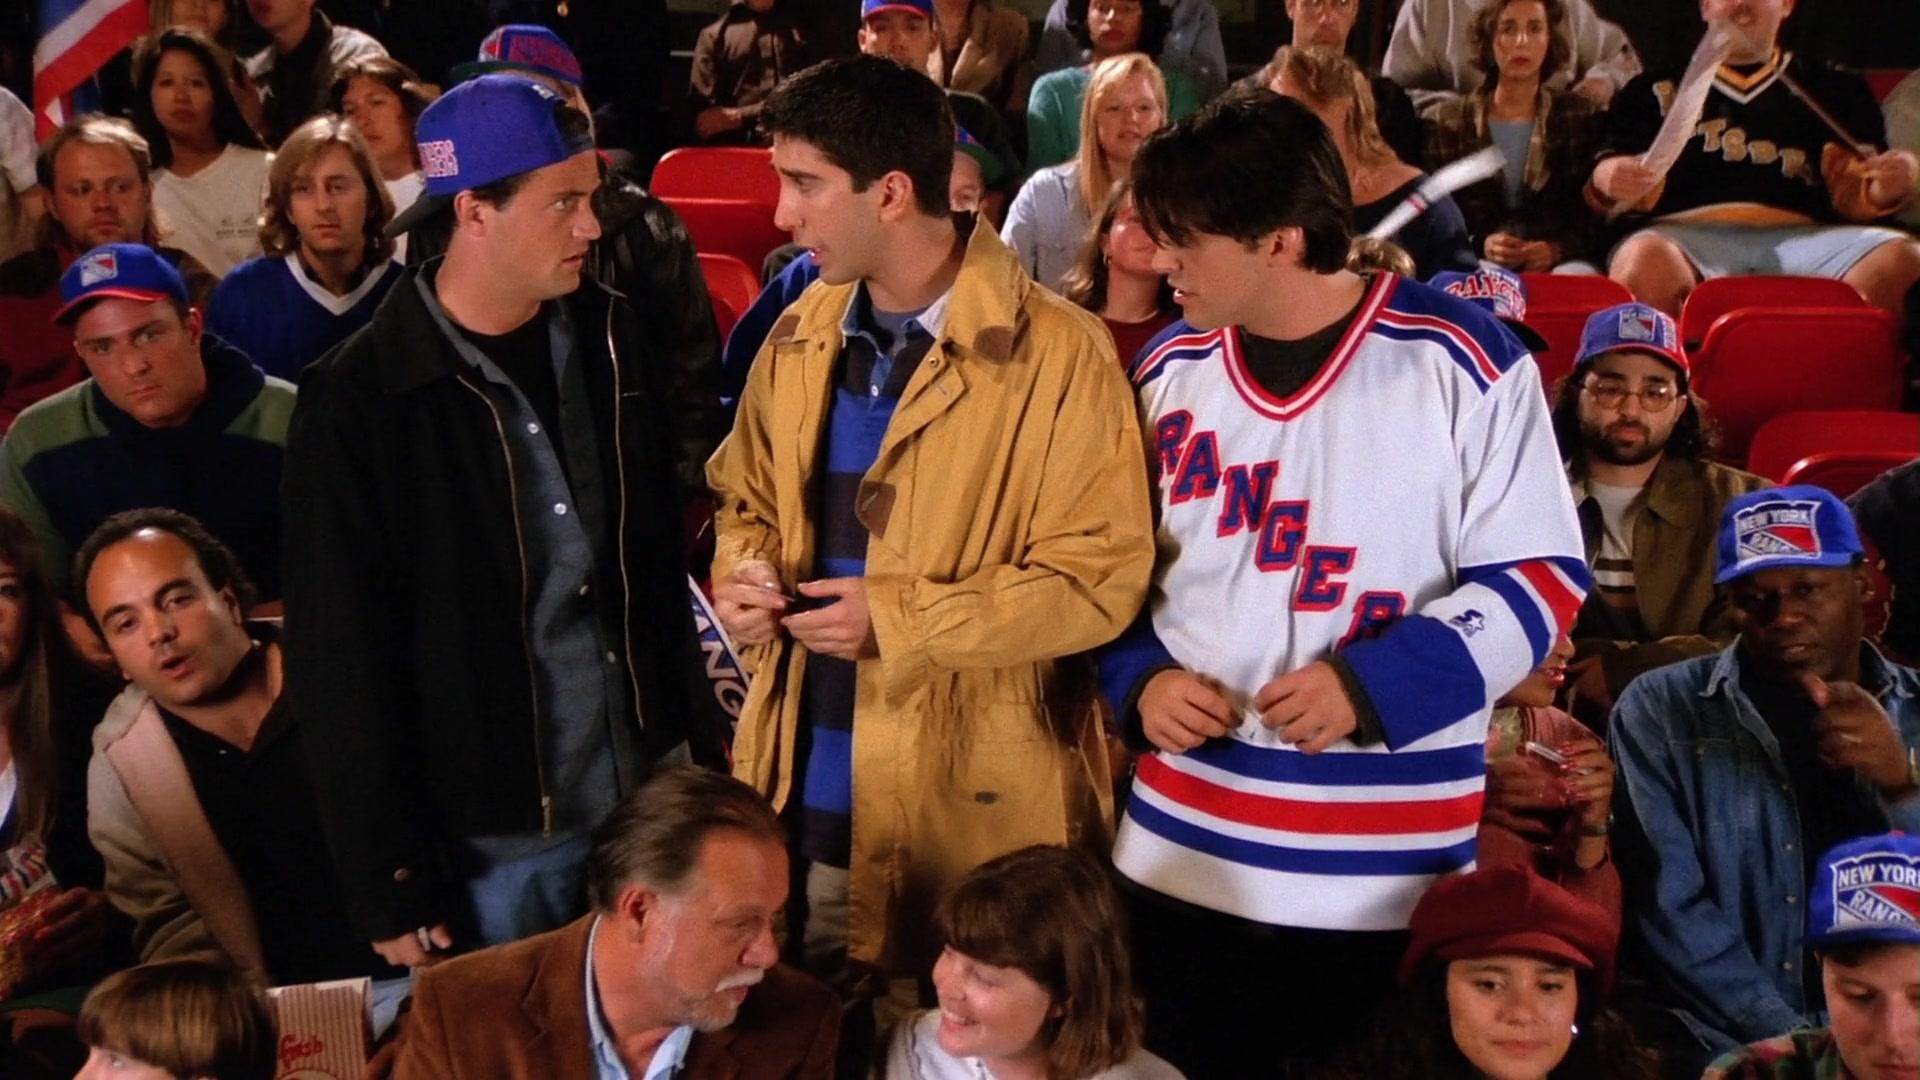 Starter New York Rangers Jersey Worn by Matt LeBlanc (Joey Tribbiani